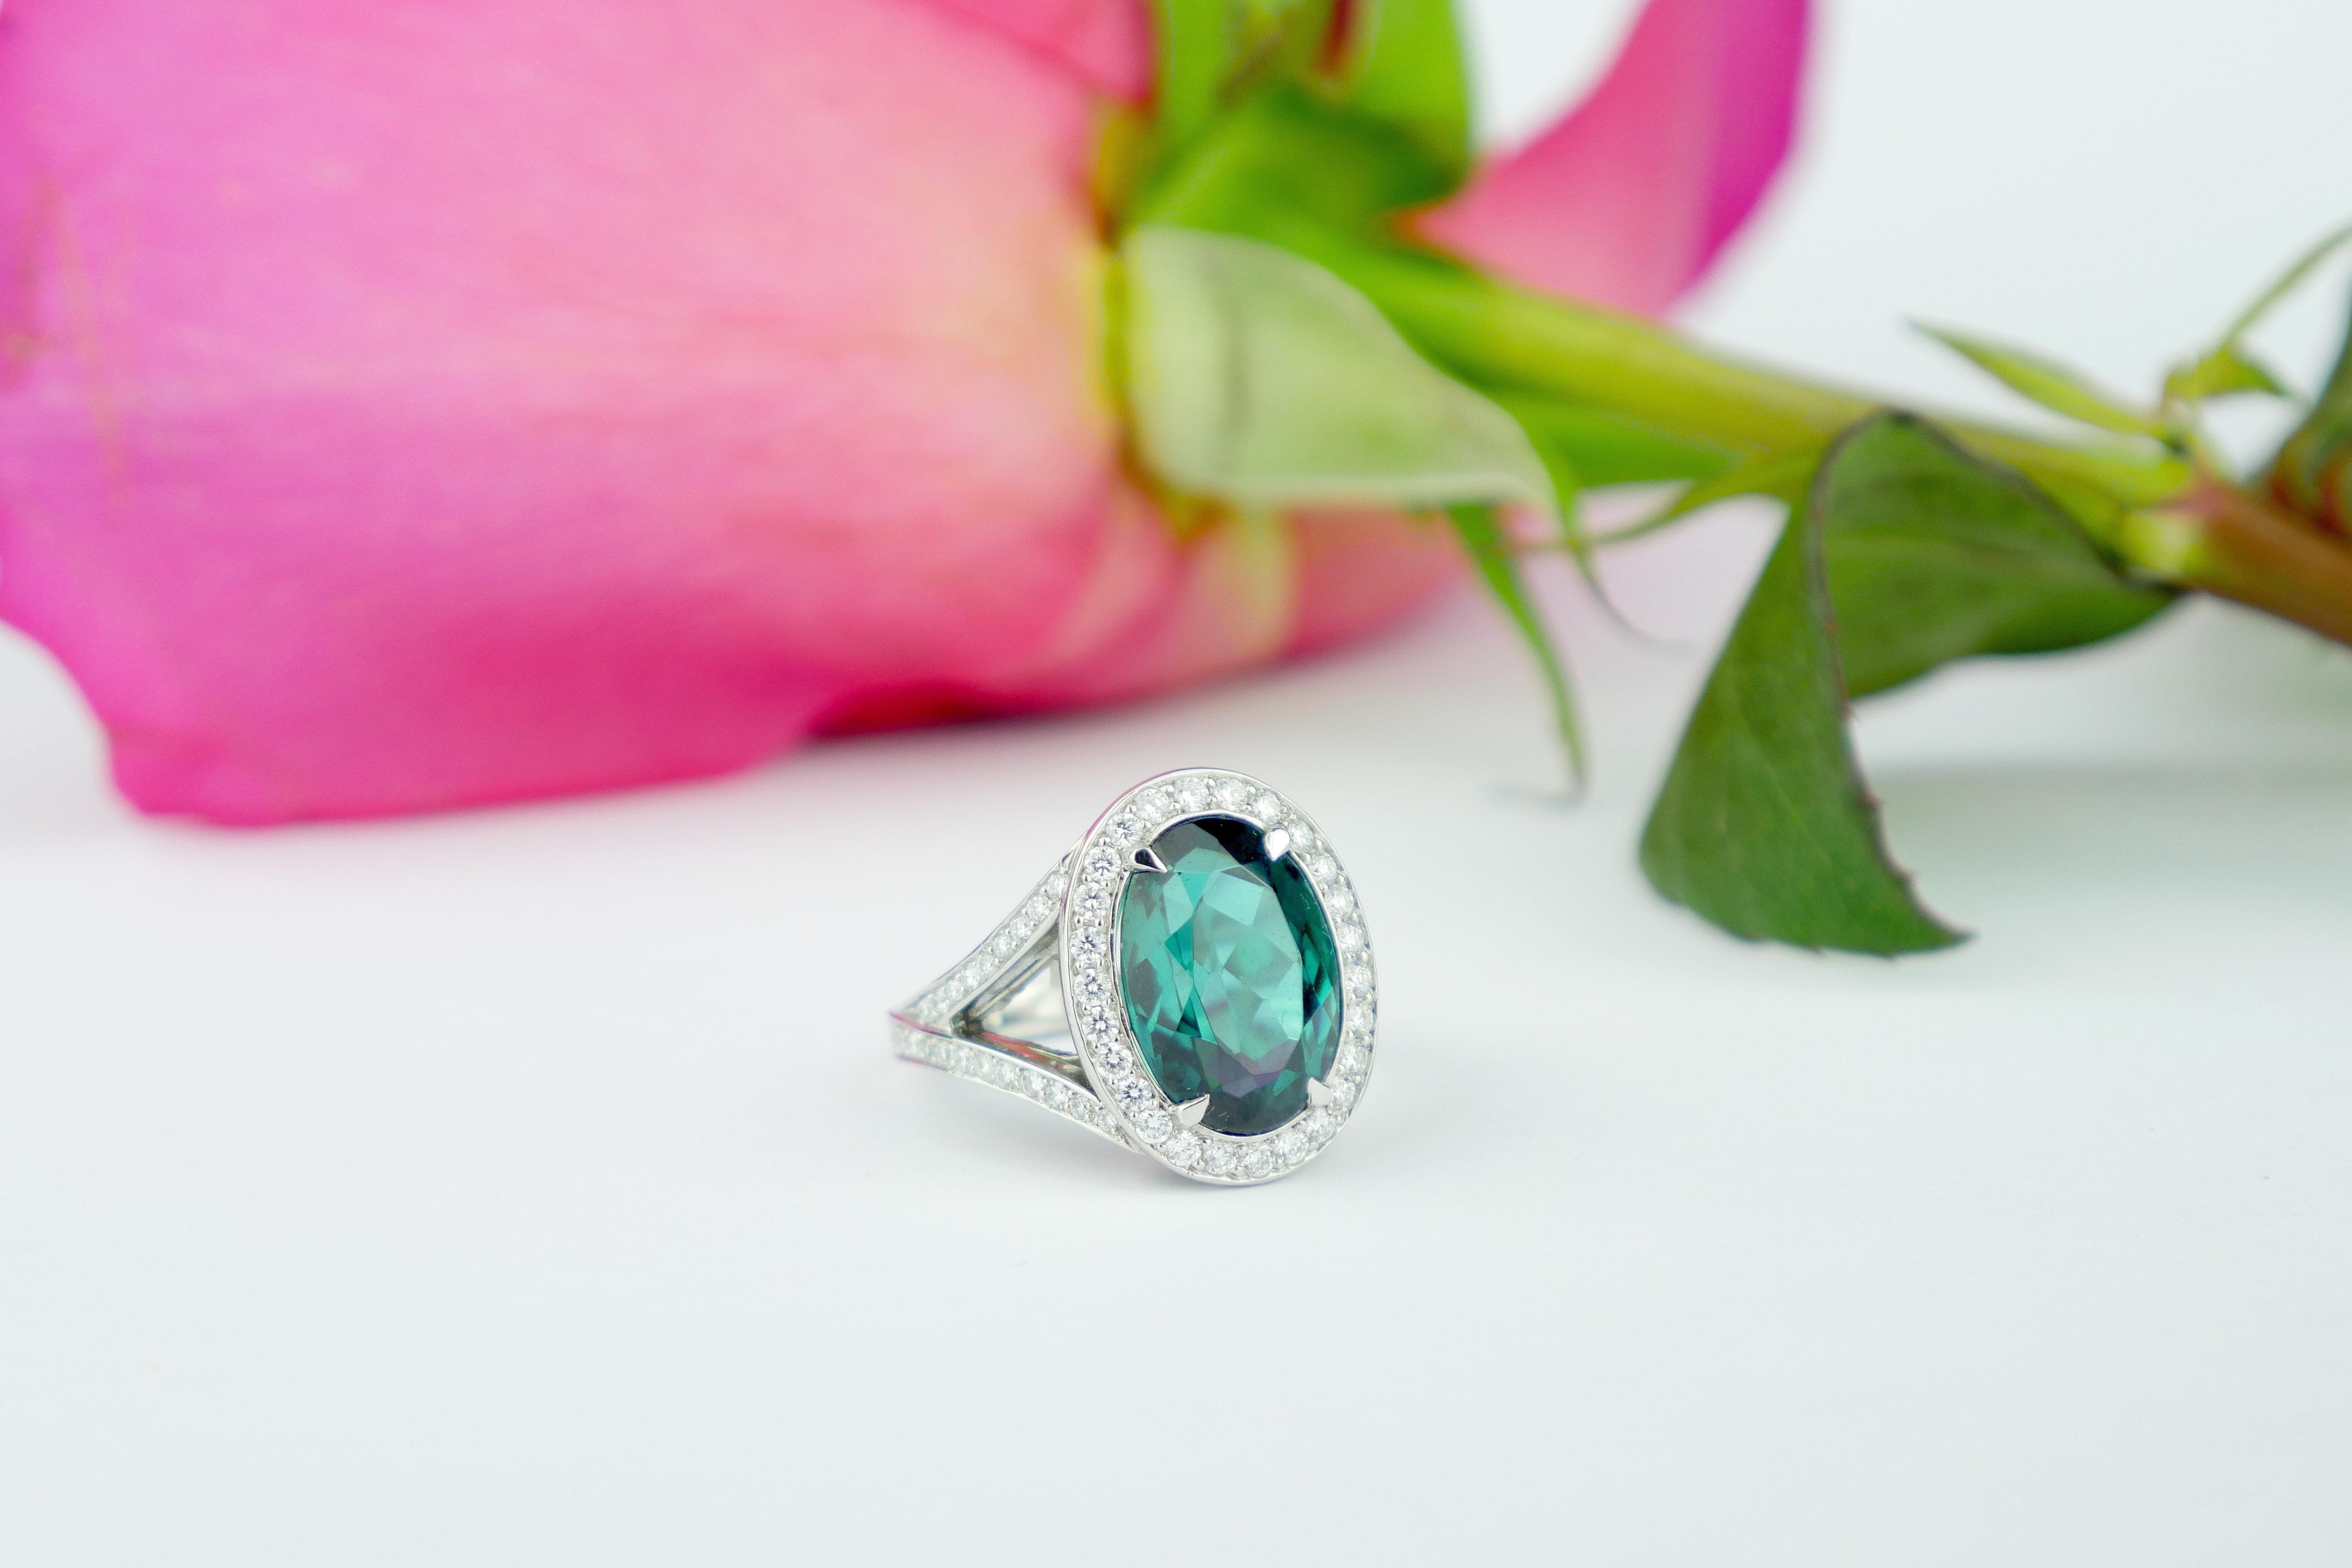 David Lawes Jewellery Ltd | Traditional Diamond Jewellery Manufacturer